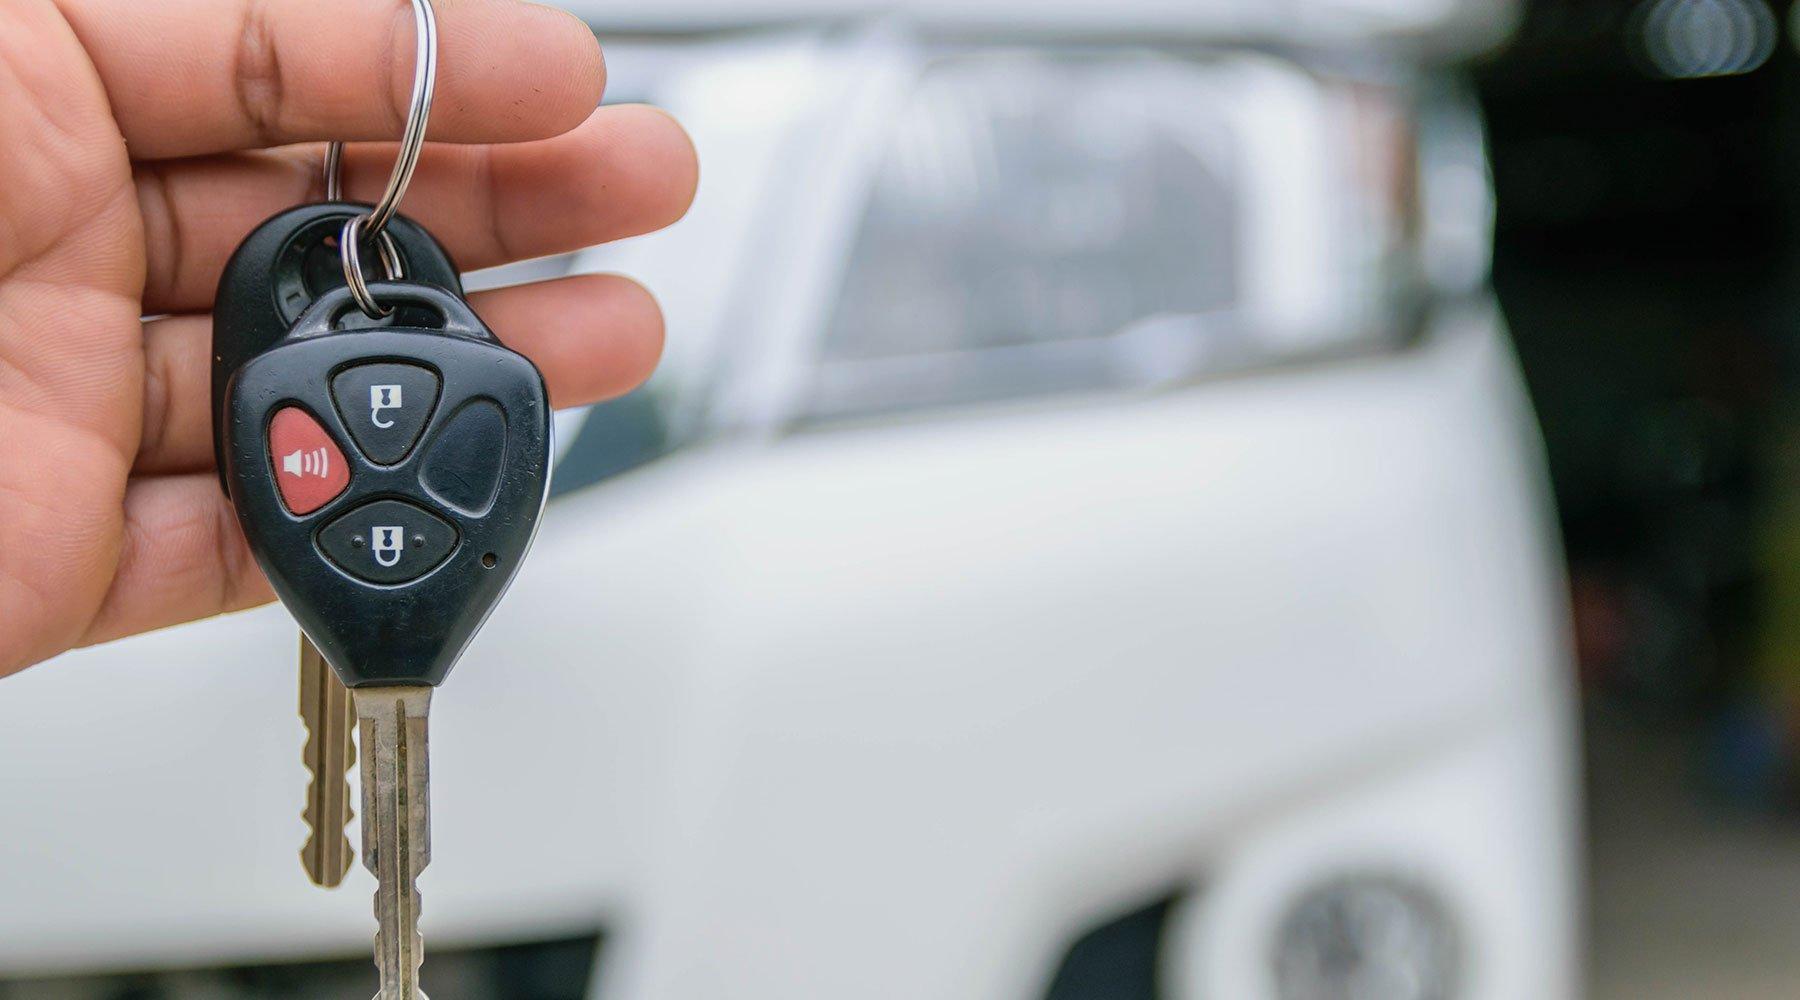 rilascio chiavi per noleggio auto